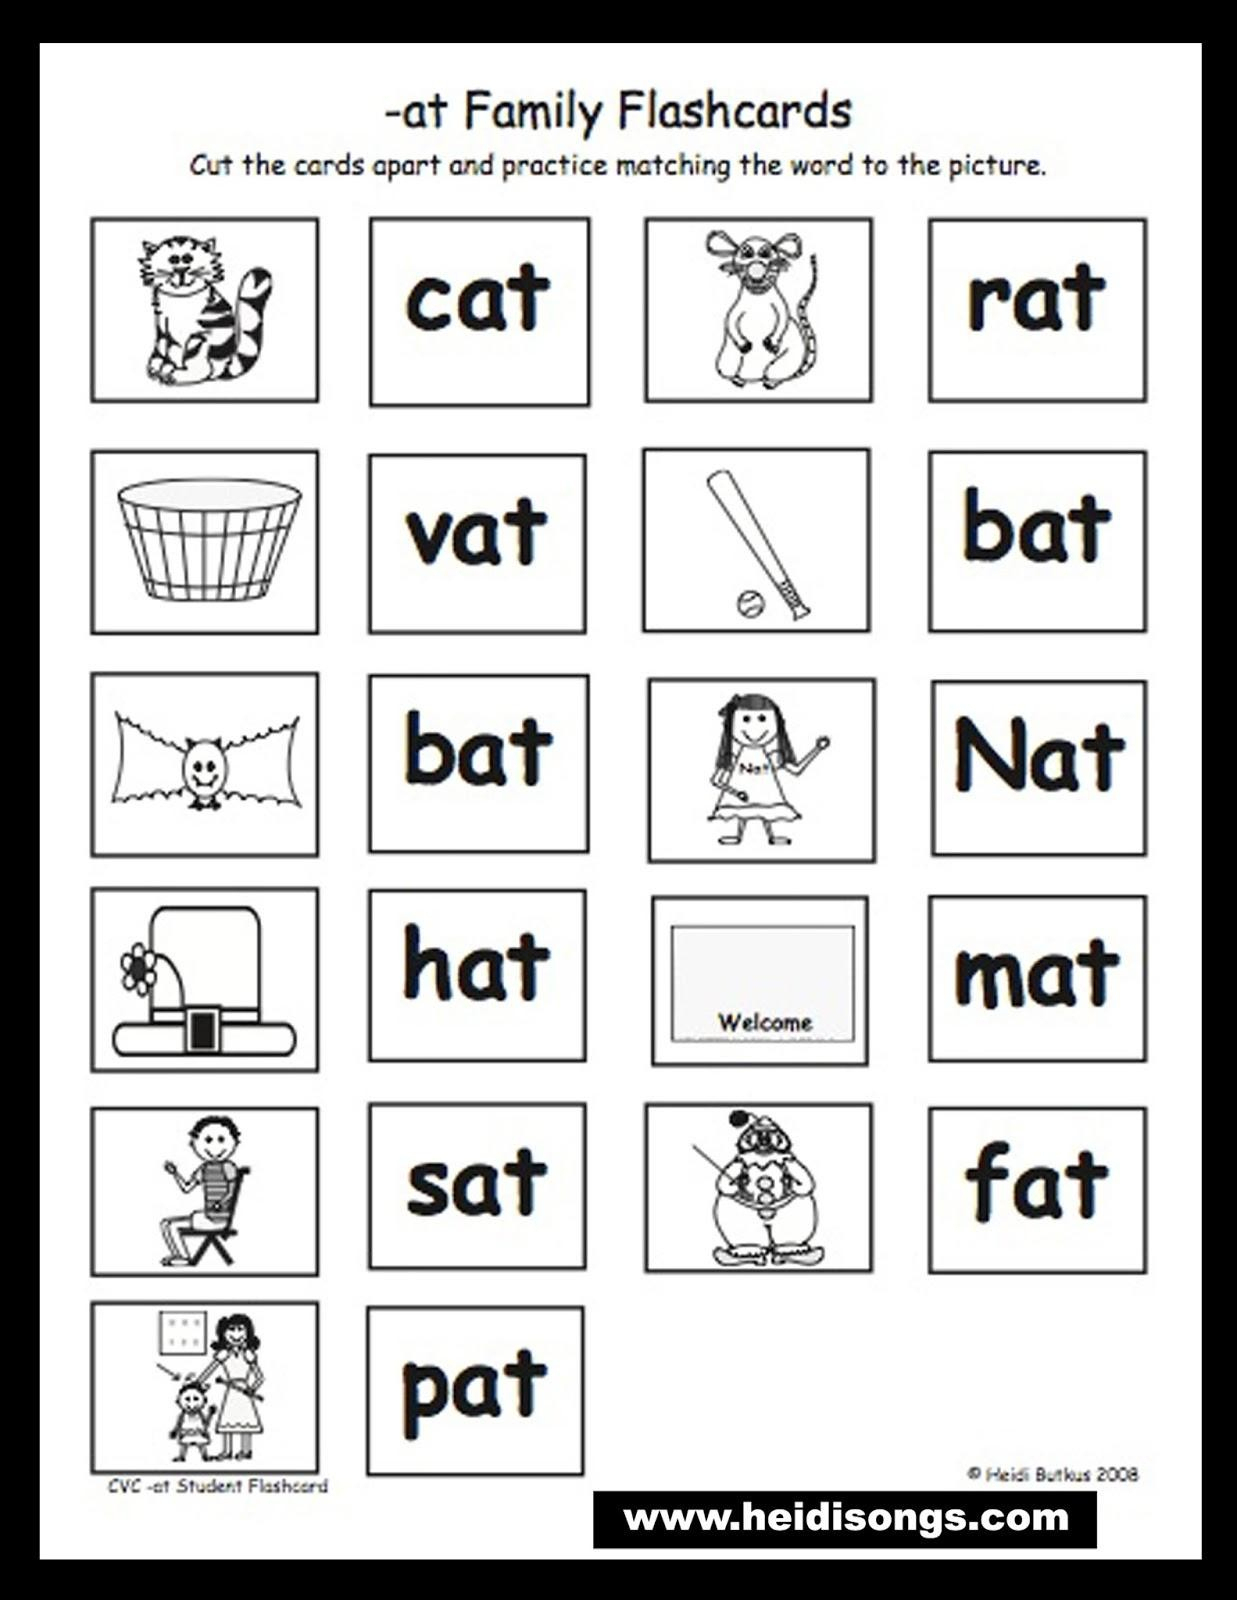 36 Math Practice Worksheets For Kindergarten – Worksheet Template | Free Printable Word Family Worksheets For Kindergarten